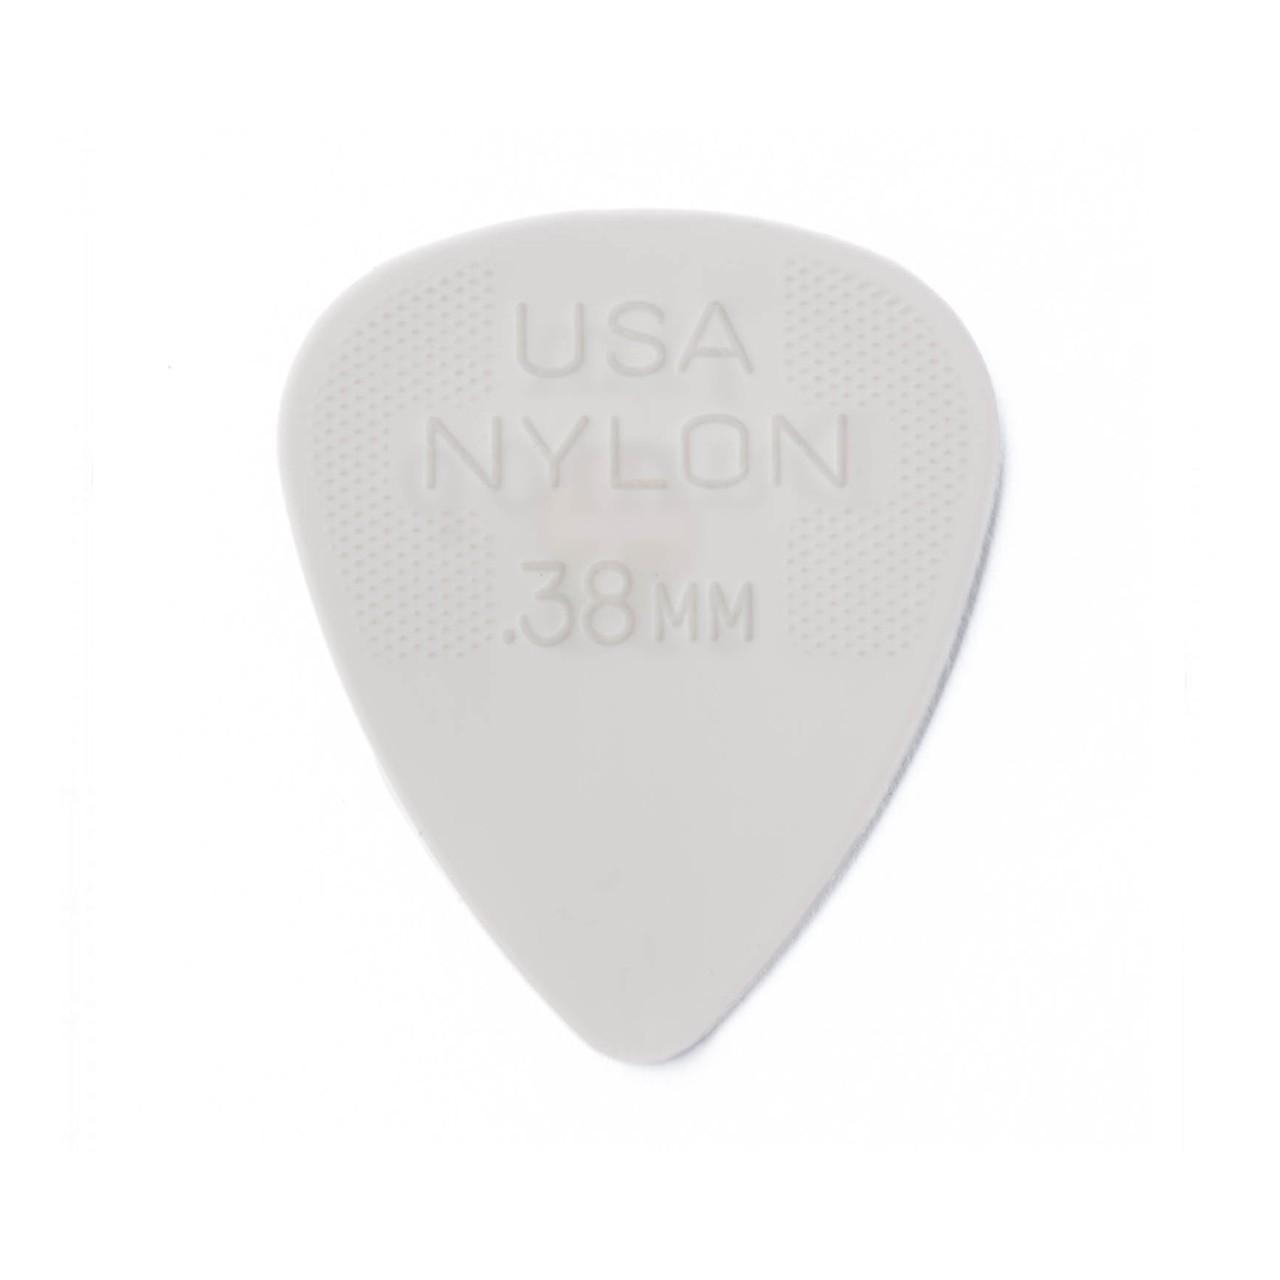 Palheta Nylon Standard 0,38mm Branca Pct C/72 44r.38 Dunlop